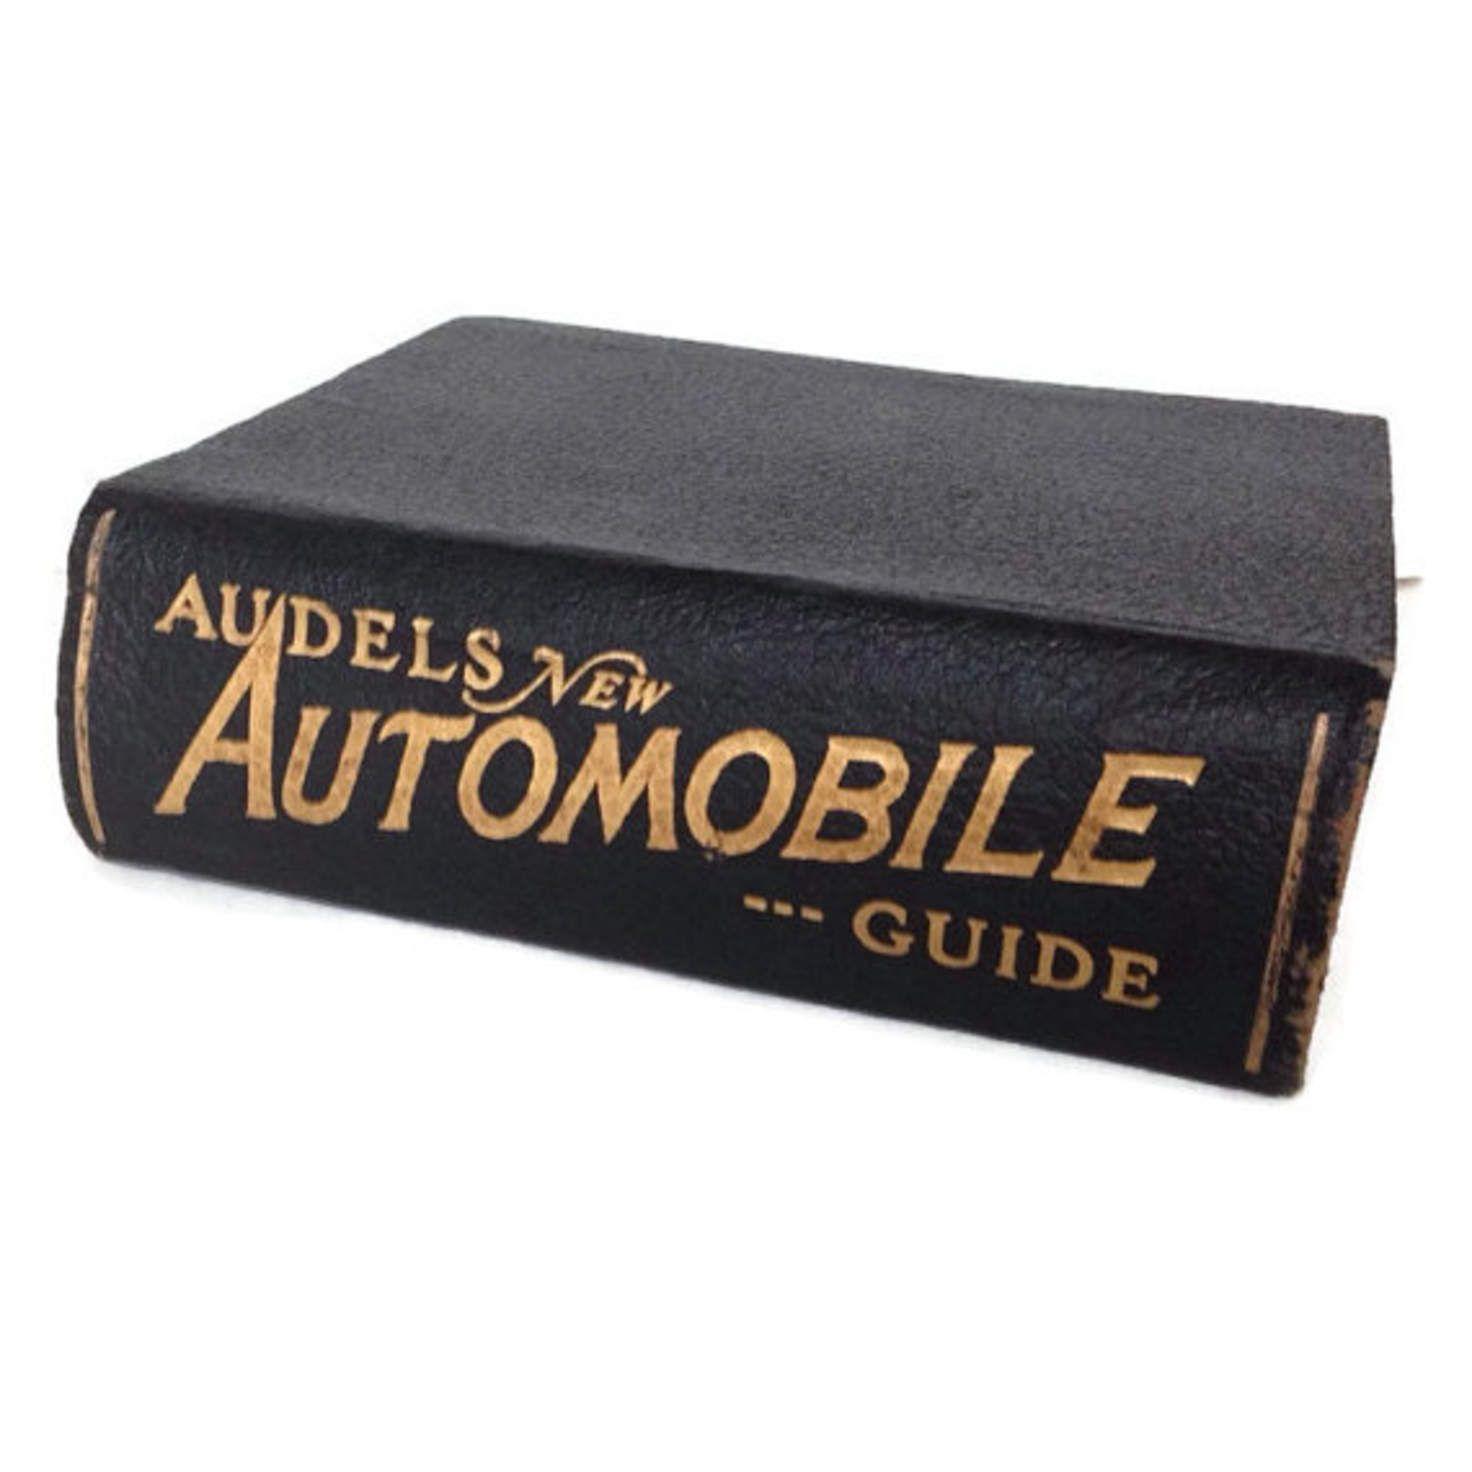 Headlight Modification The 1947 Manual Guide